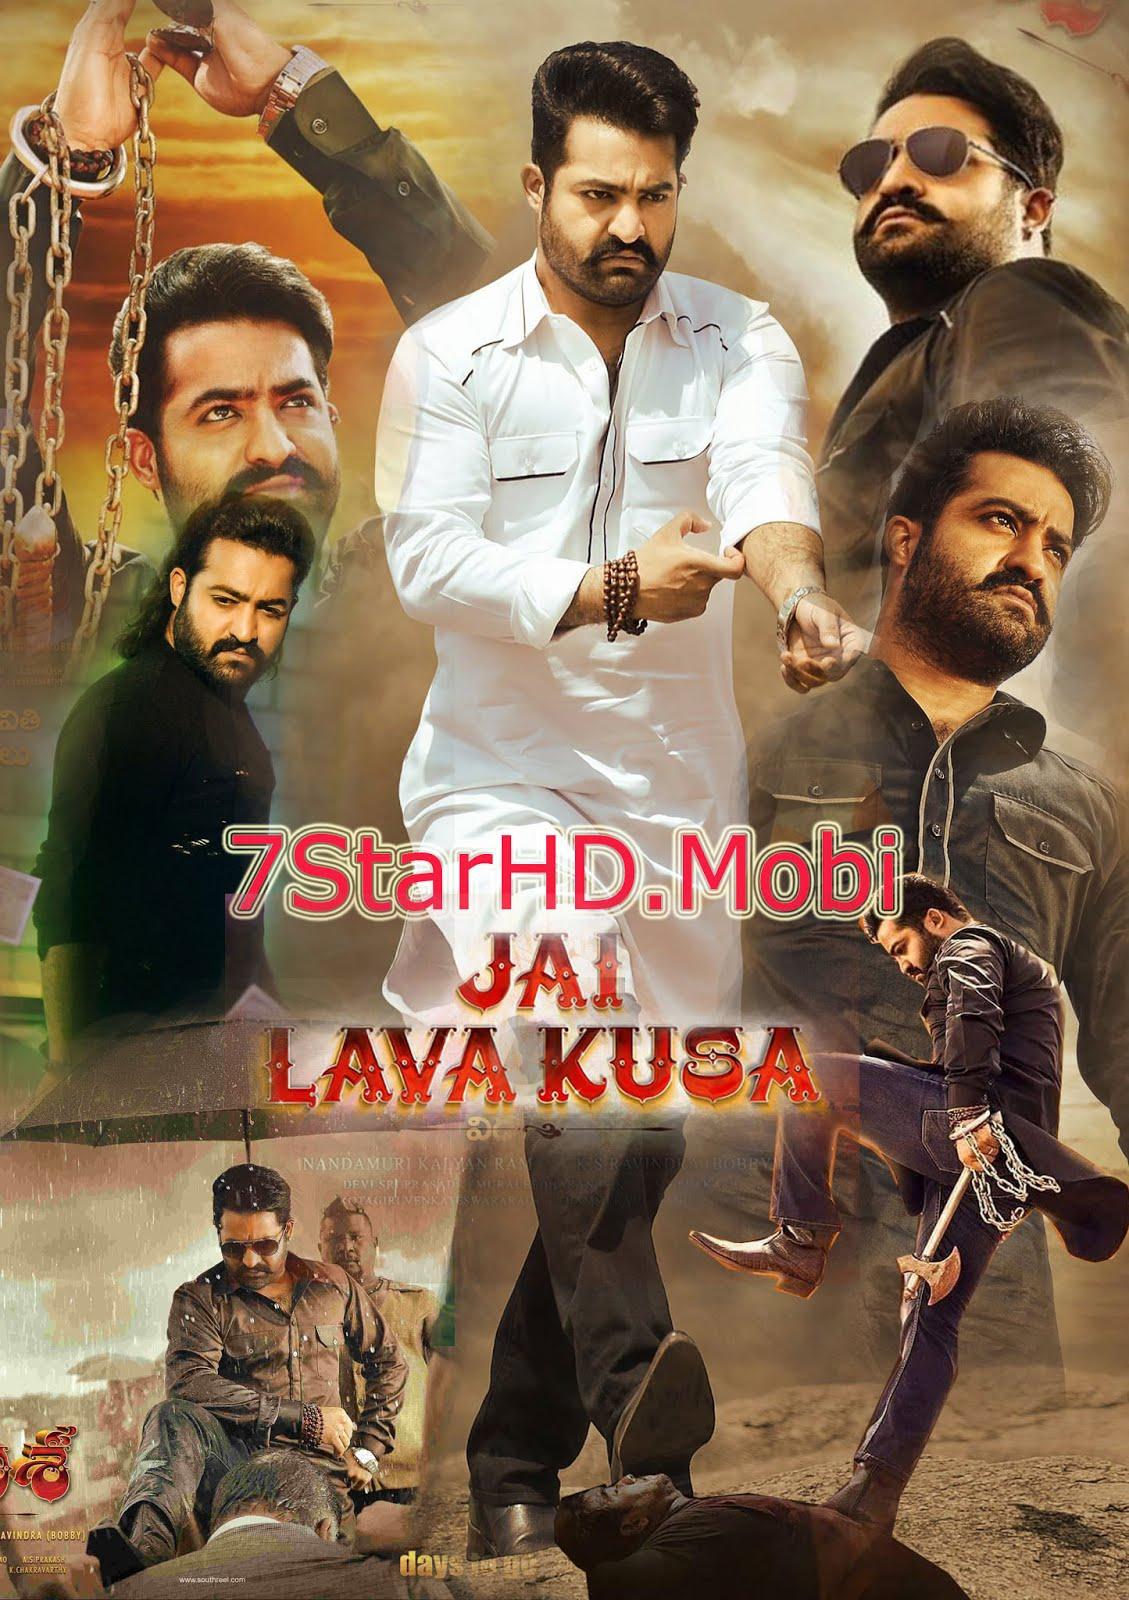 Jai Lava Kusa 2017 Hindi Dual Audio 650MB HDRip 720p HEVC x265 UNCUT